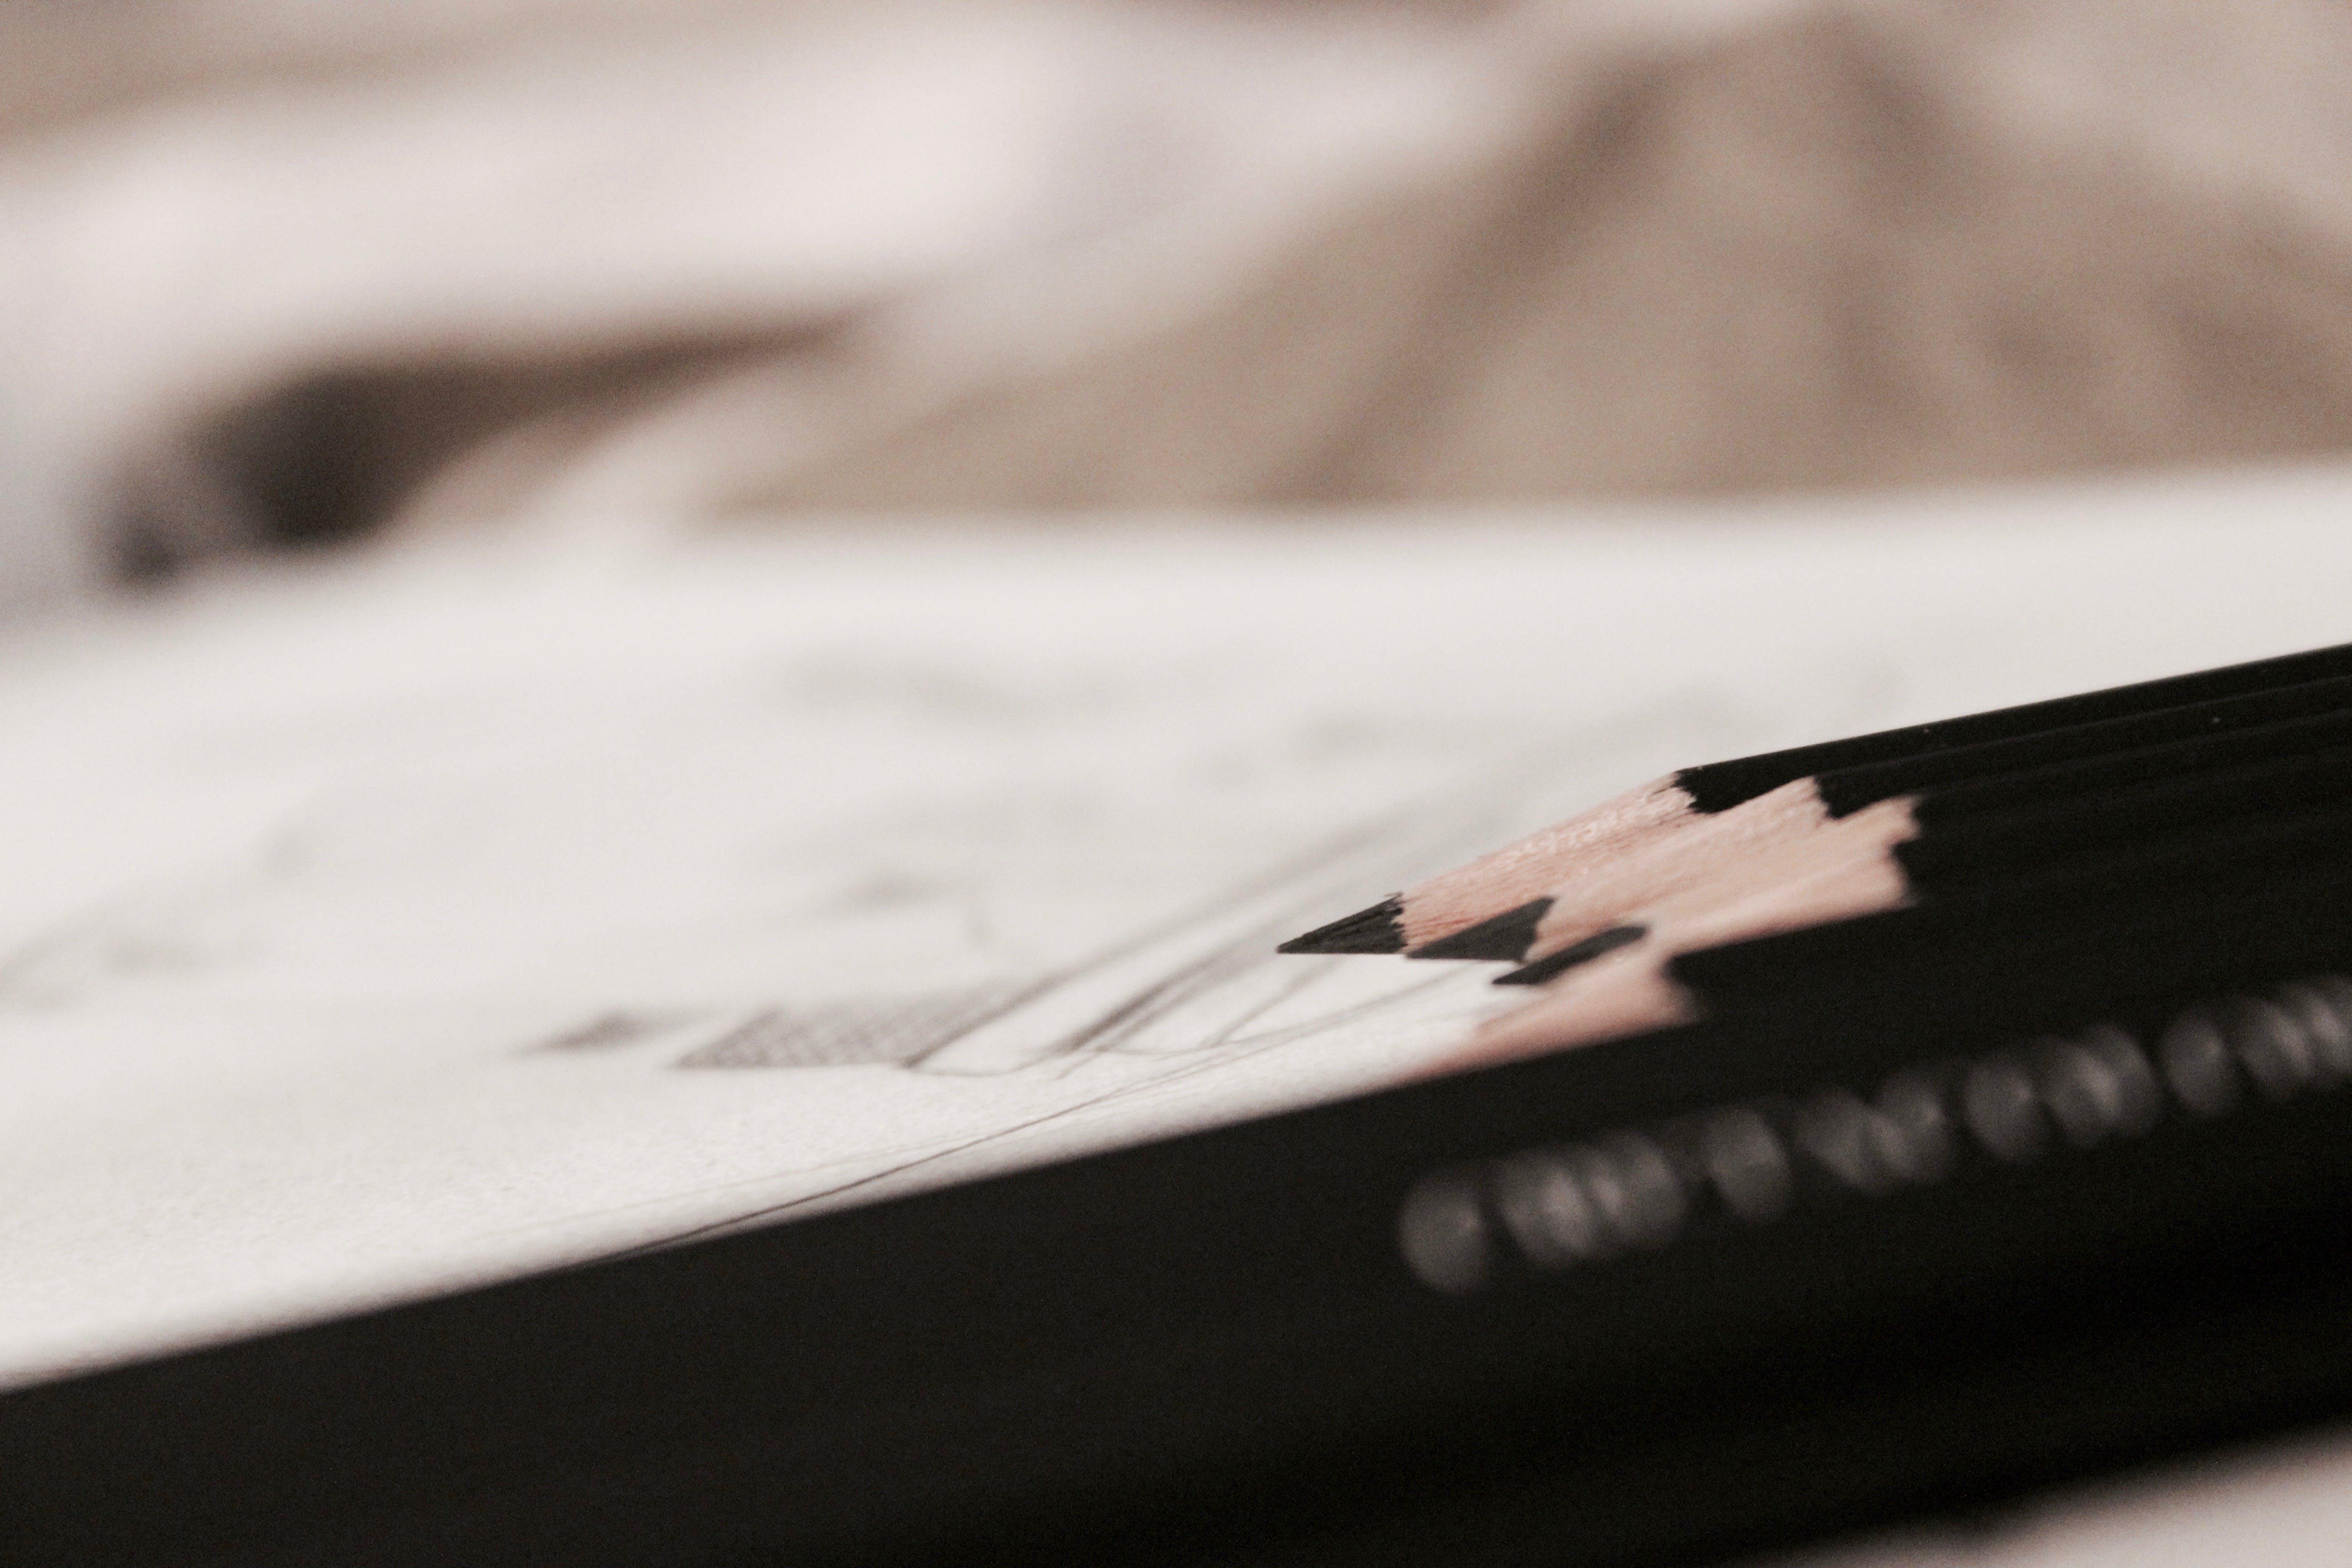 Free stock photo of night, desk, pencils, sketching